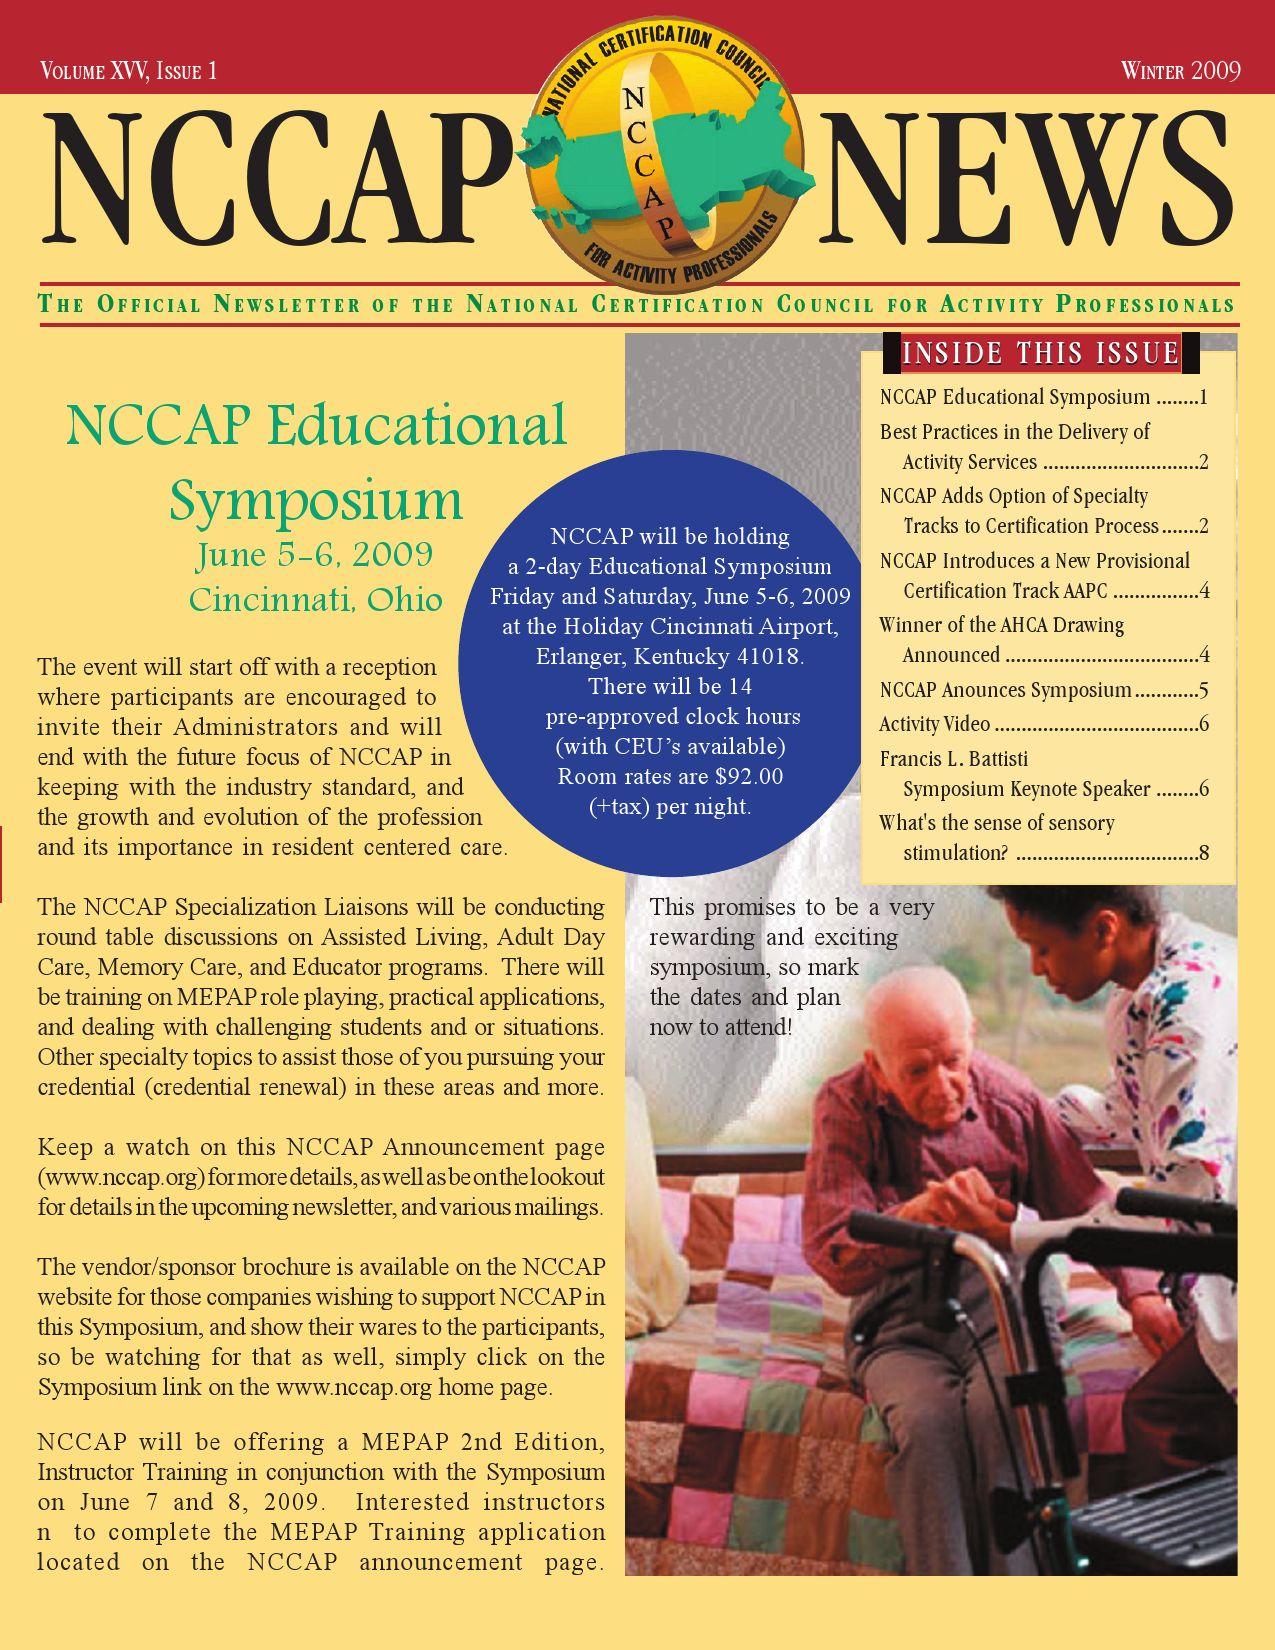 Nccap educational symposium by national certification council for nccap educational symposium by national certification council for activity professionals issuu xflitez Gallery